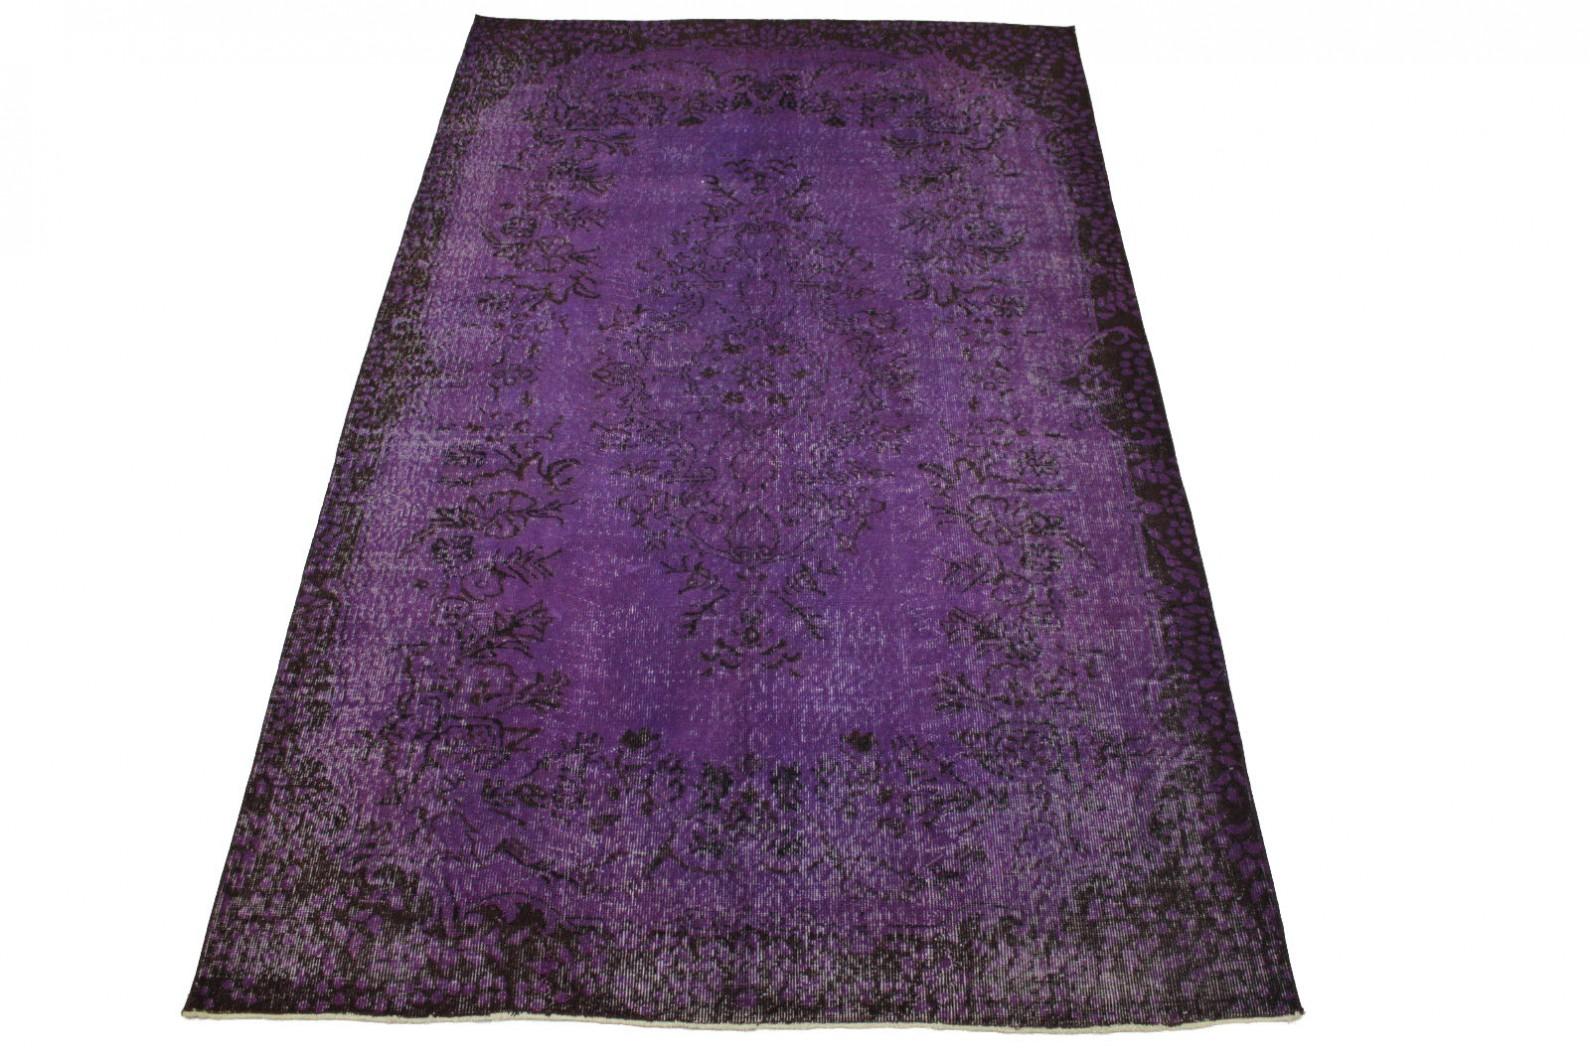 vintage teppich lila in 280x170cm 1011 4 bei kaufen. Black Bedroom Furniture Sets. Home Design Ideas